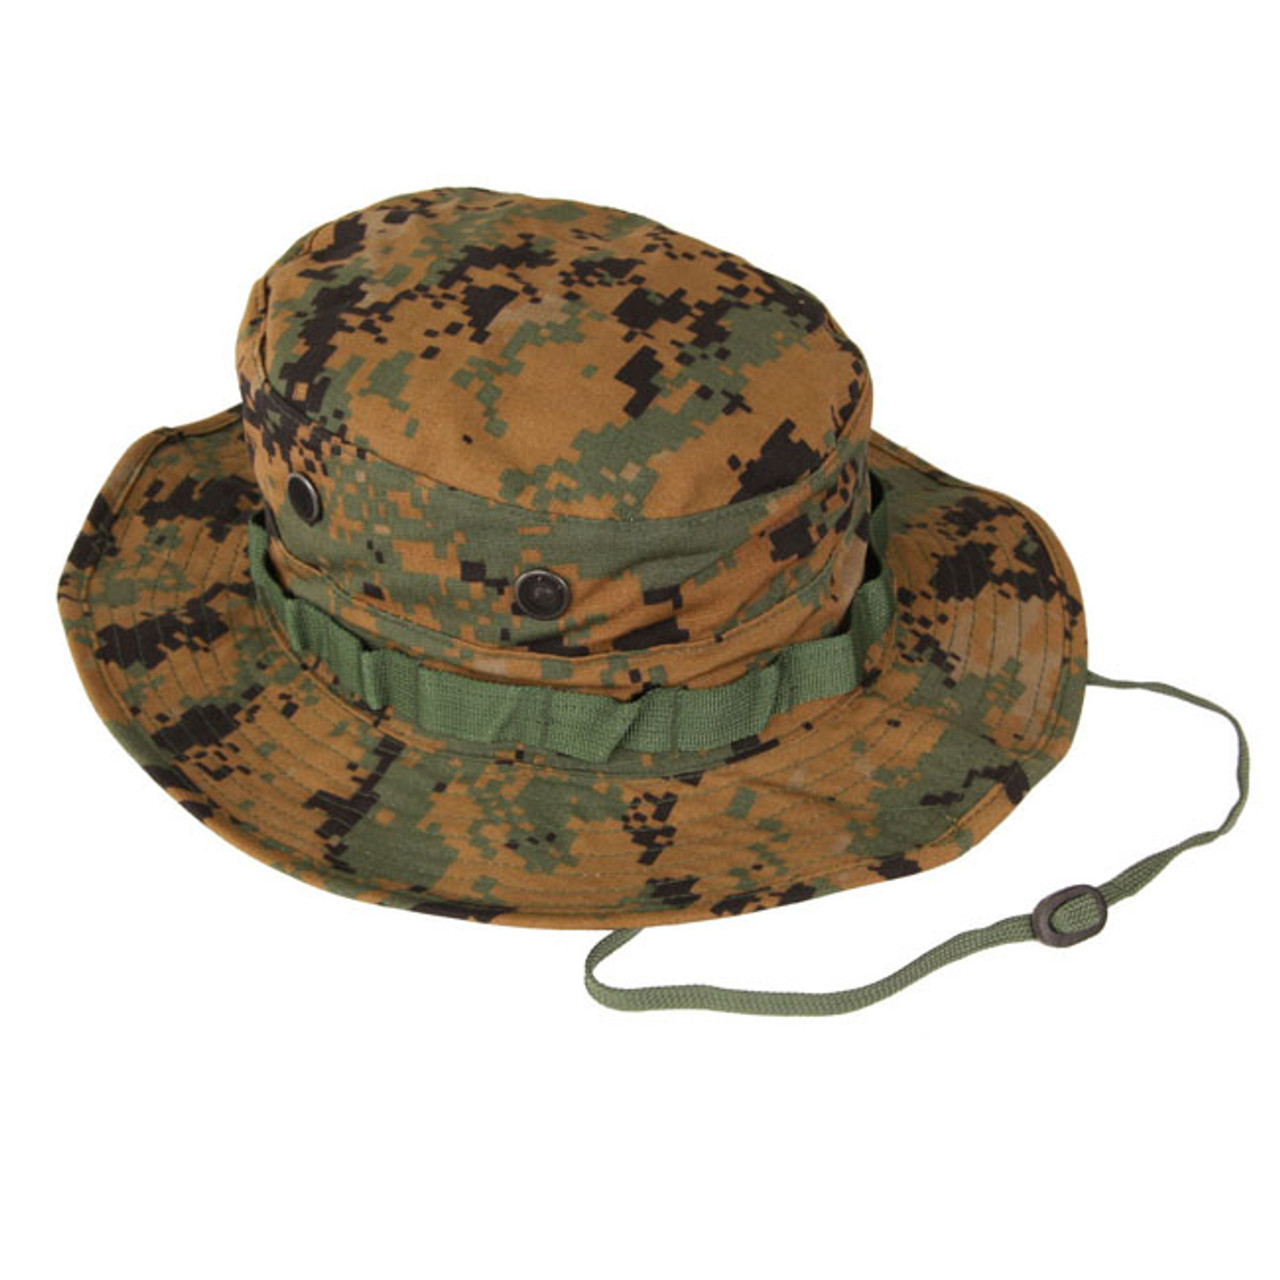 Propper Poly   Cotton Ripstop Boonie Hats - F5504-38 fc62e87b8c7c